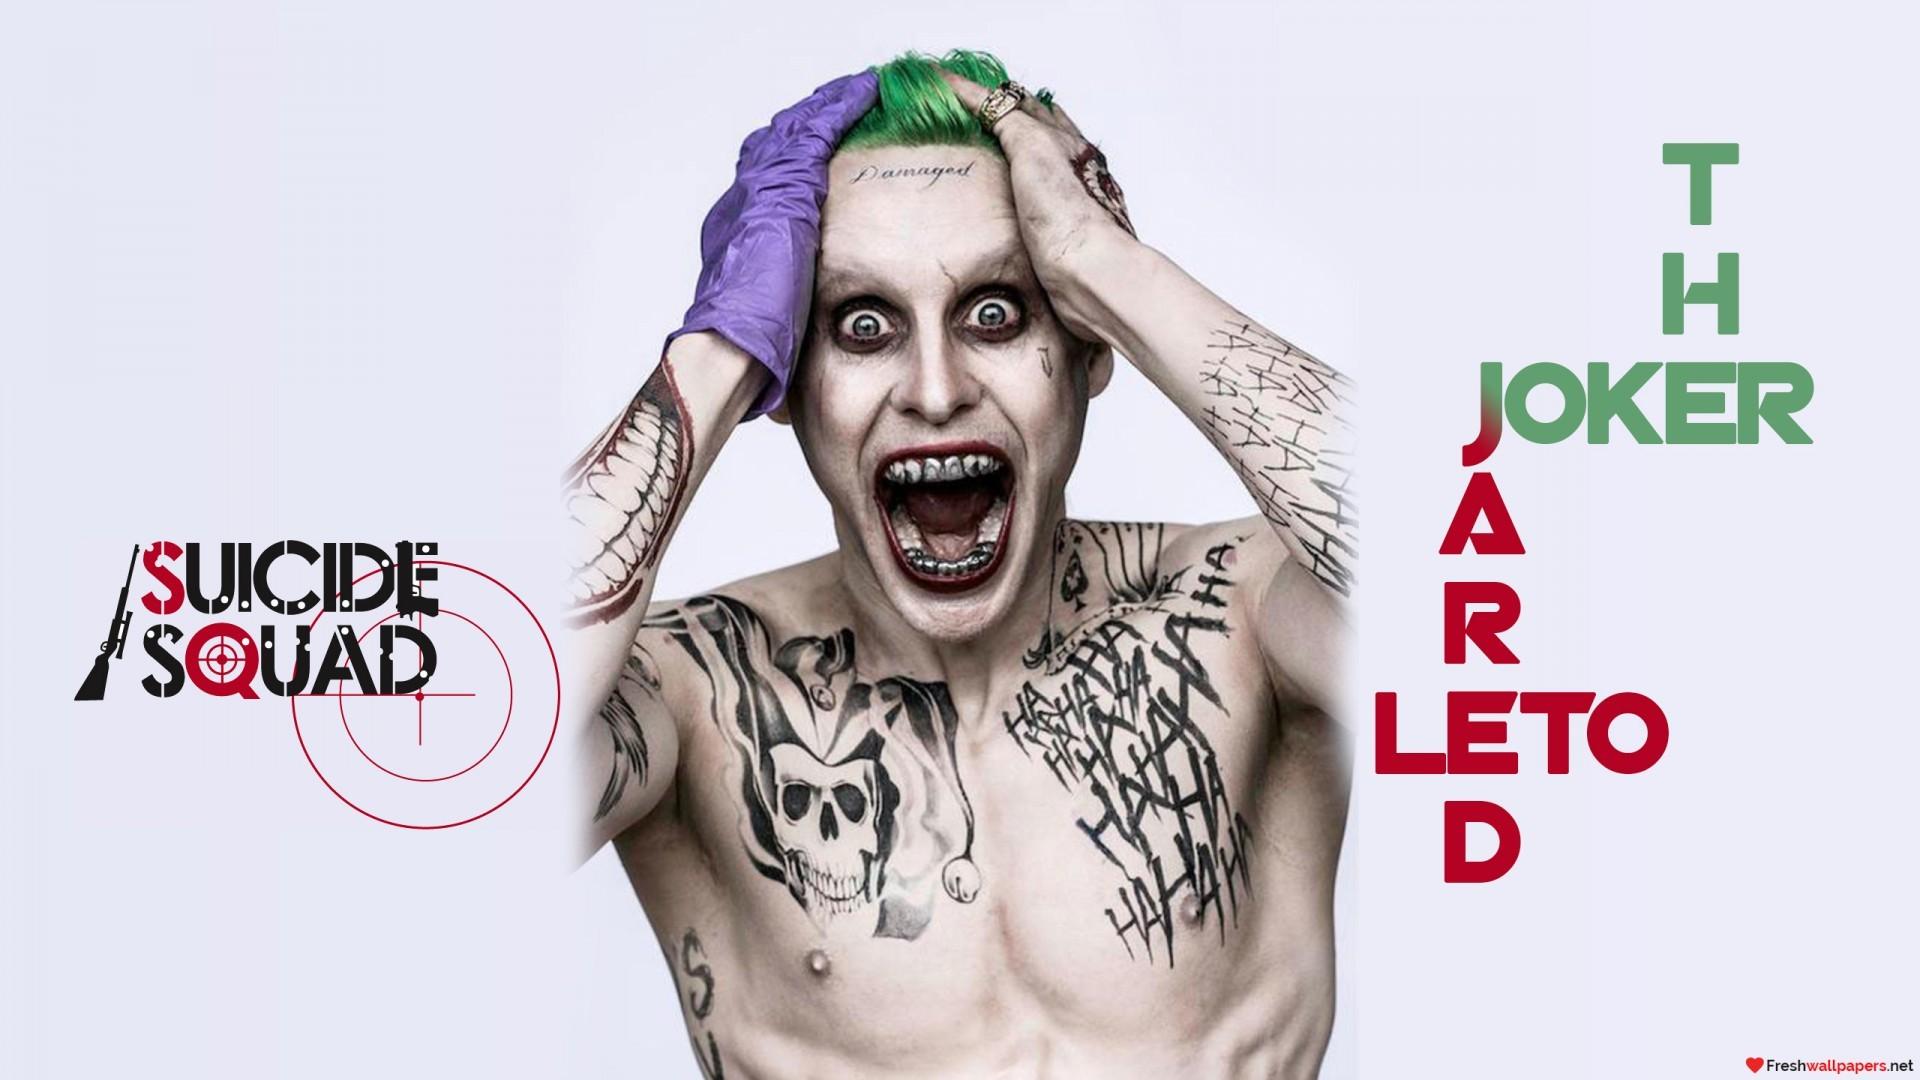 Suicide Squad Wallpaper Movie HD The Joker